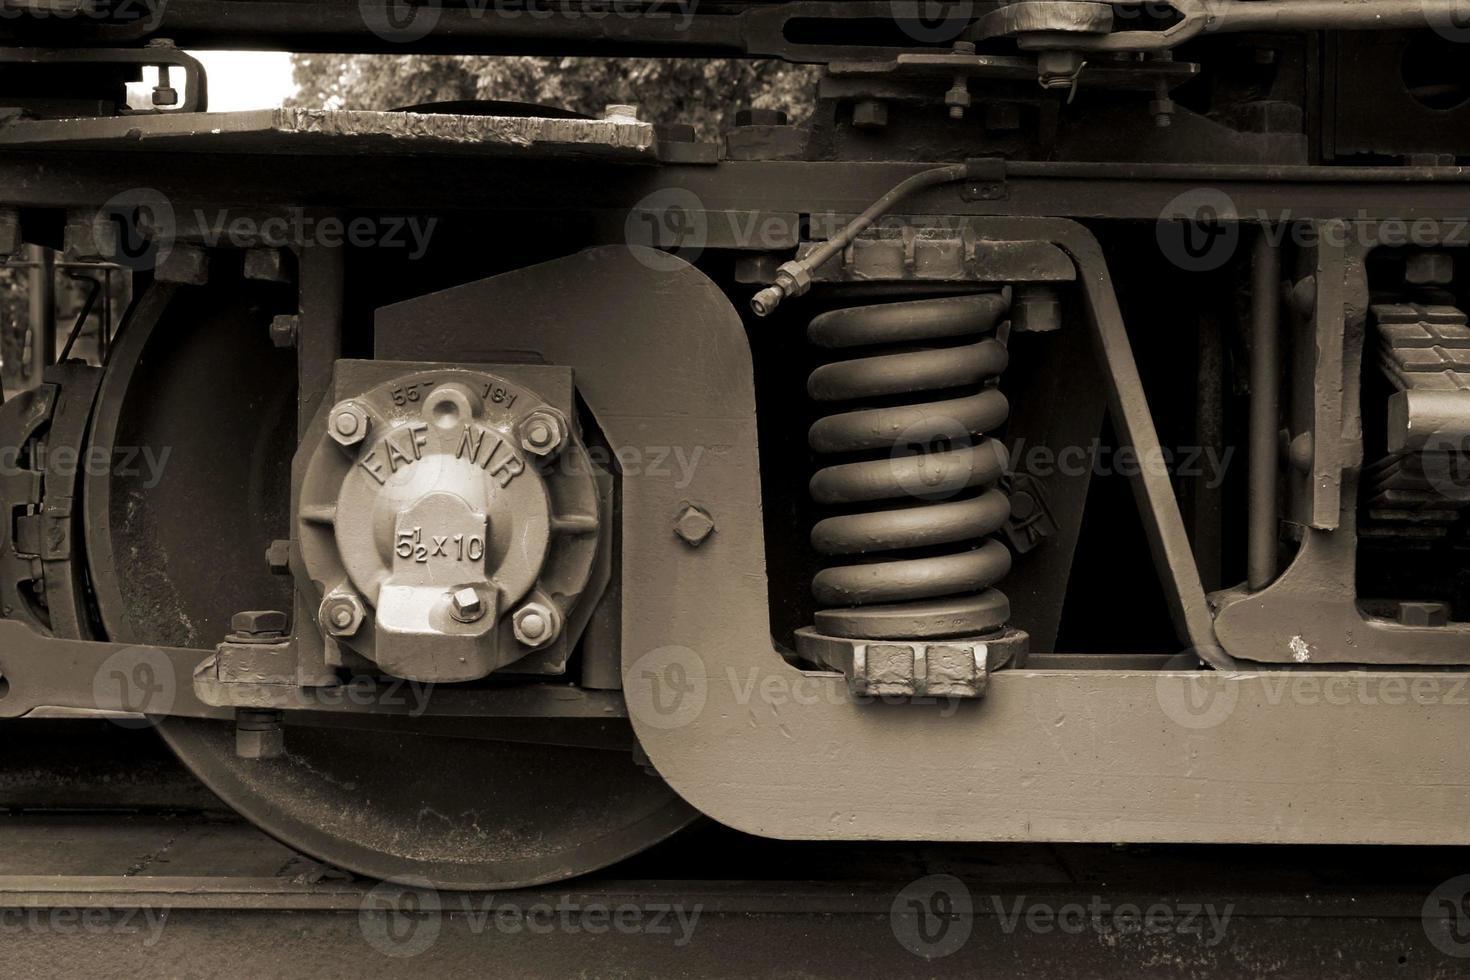 Railrowd wheel photo